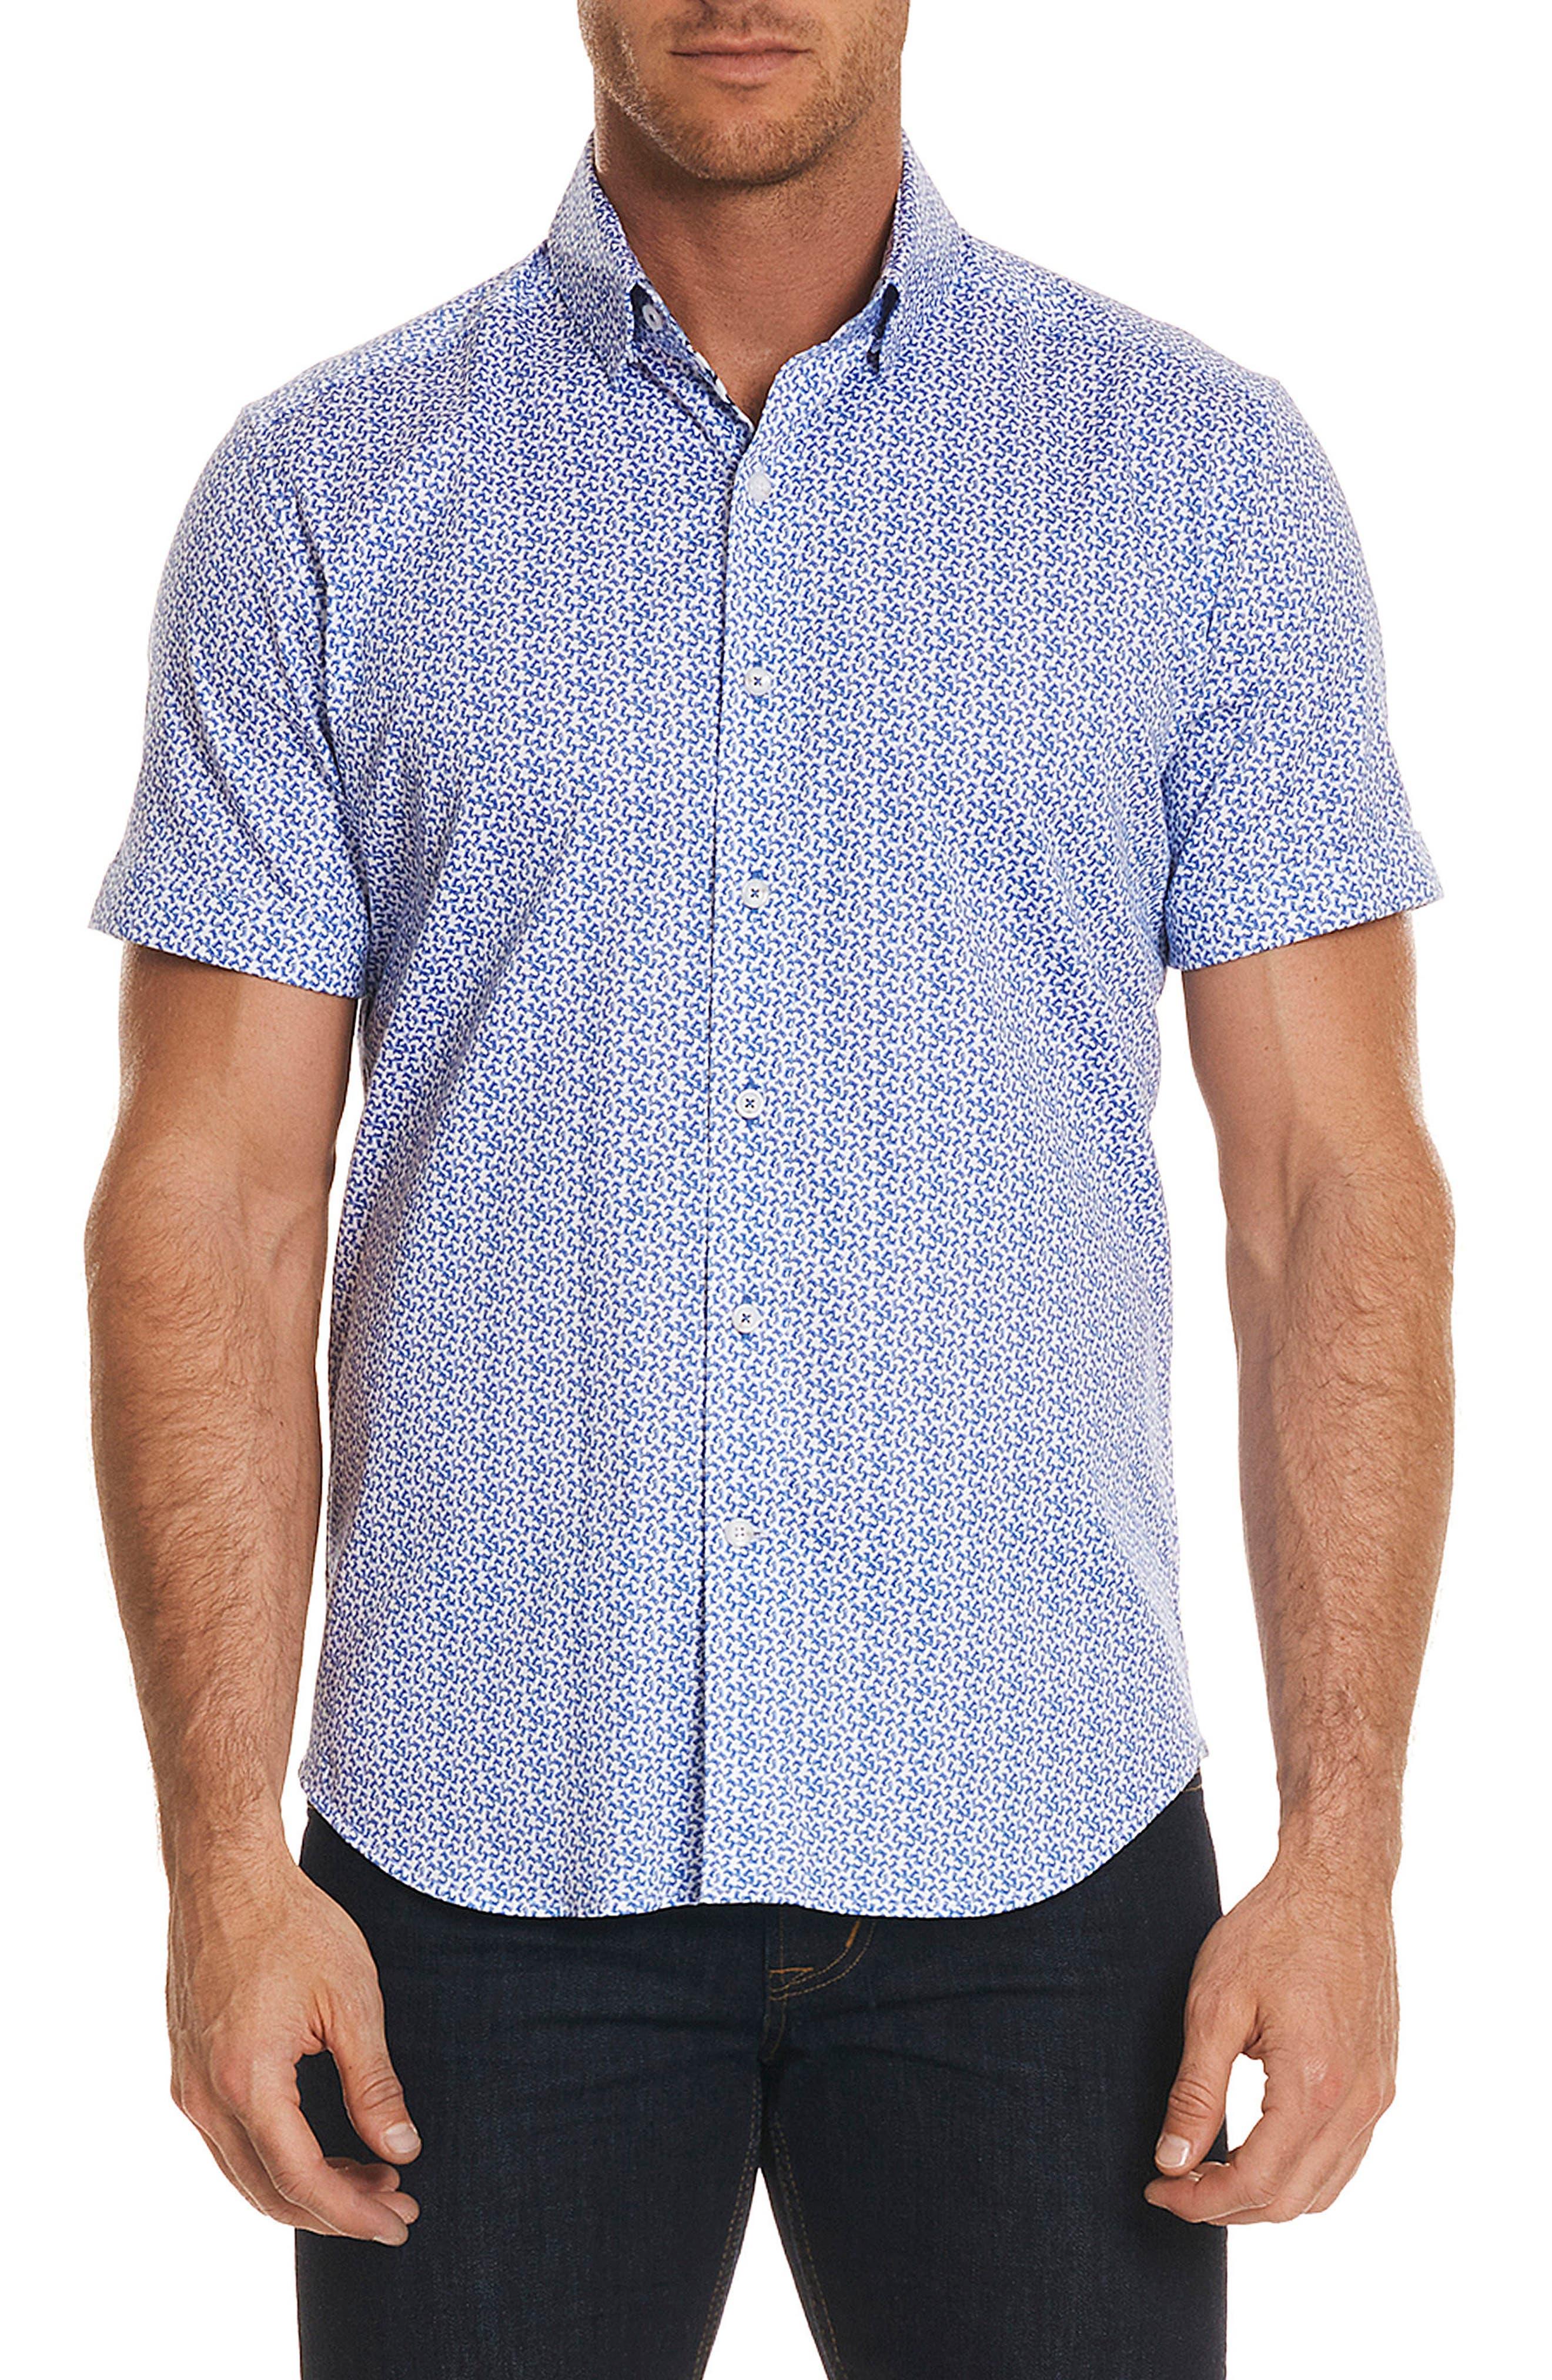 Hartman Tailored Fit Sport Shirt,                         Main,                         color, Blue